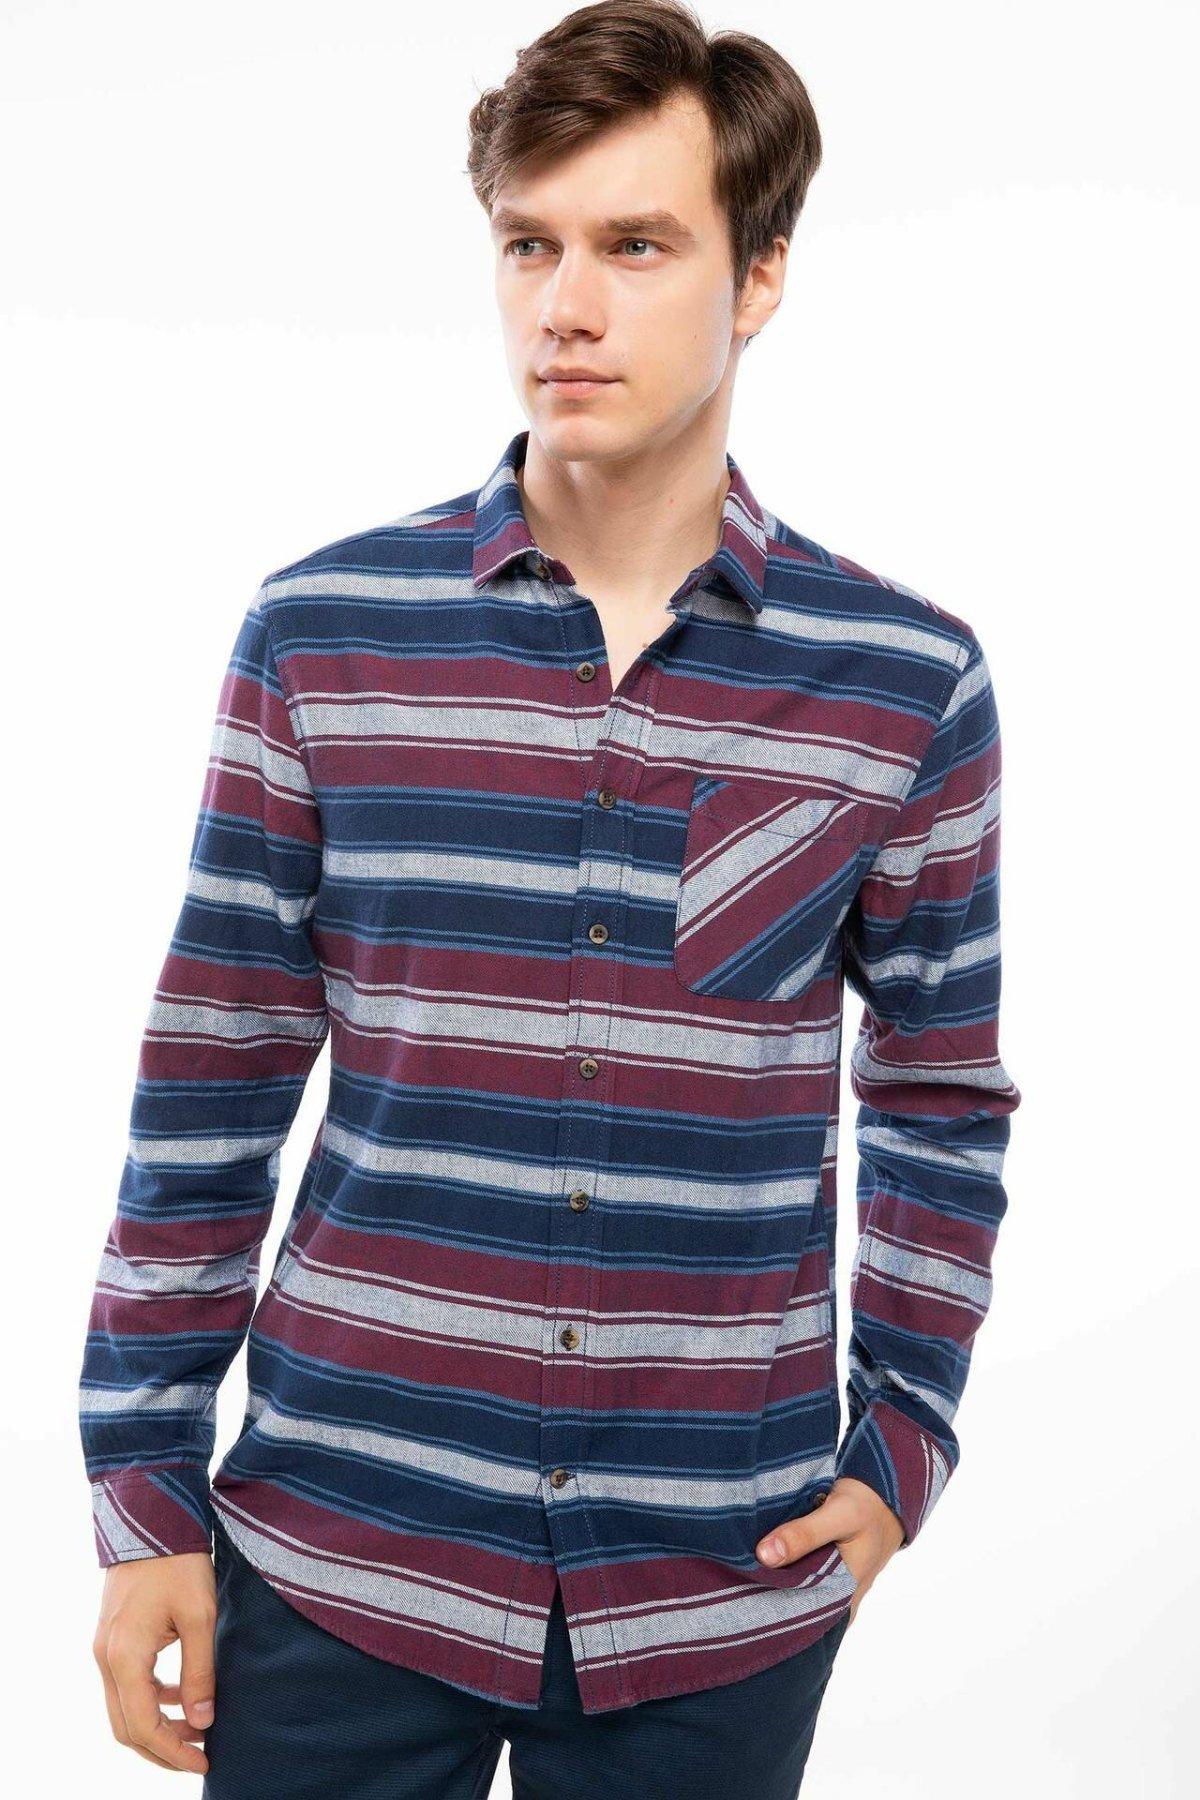 DeFacto Man Red Blue Striped Line Cotton Shirts Men's Casual Pockets Shirts Tops Long Sleeve Shirt-I9834AZ18AU